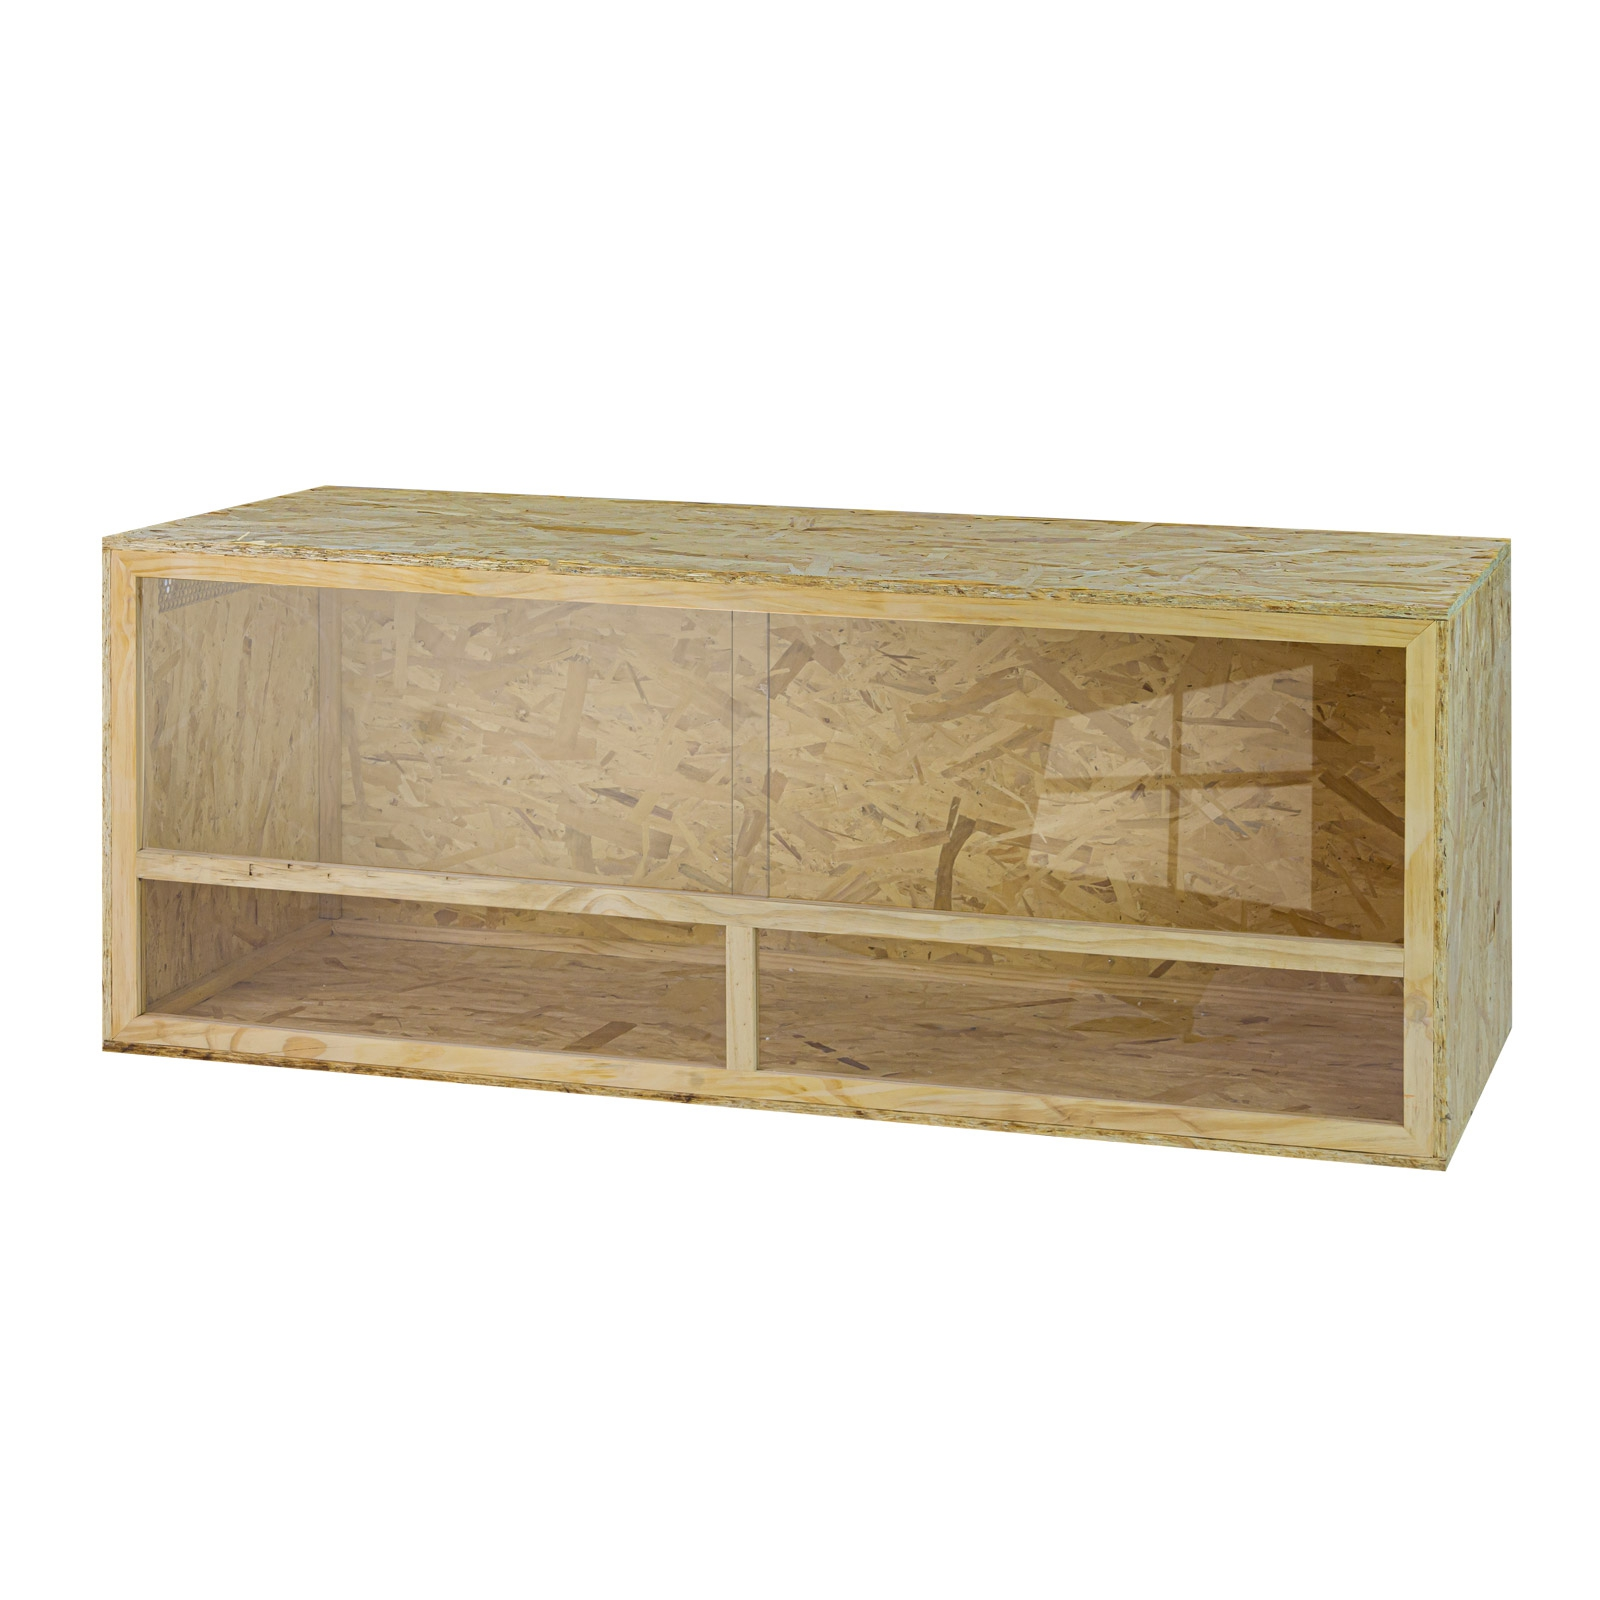 Dema Holz Terrarium Holzkäfig Reptilien Schlangen Holzterrarium 150 x 60 x 60 aus OSB 41601